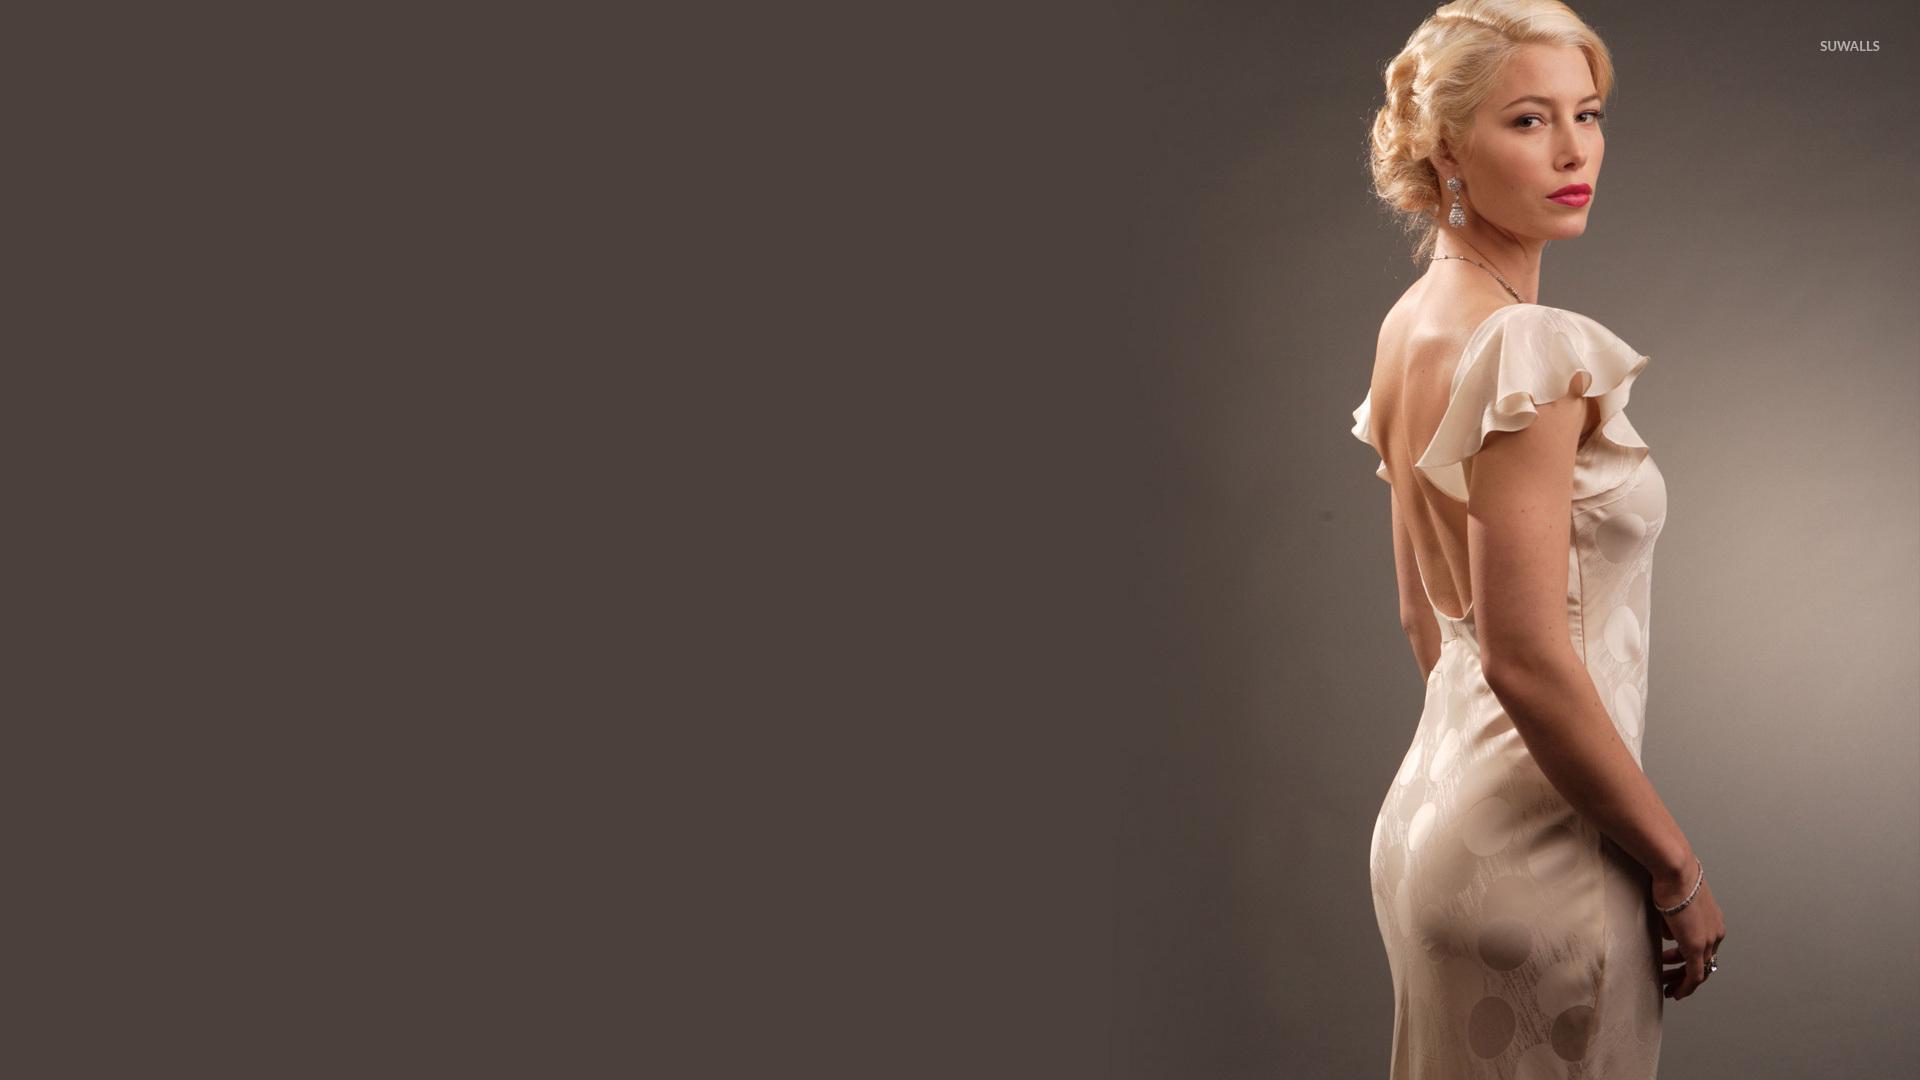 jessica biel hd wallpaper celebrity - photo #27